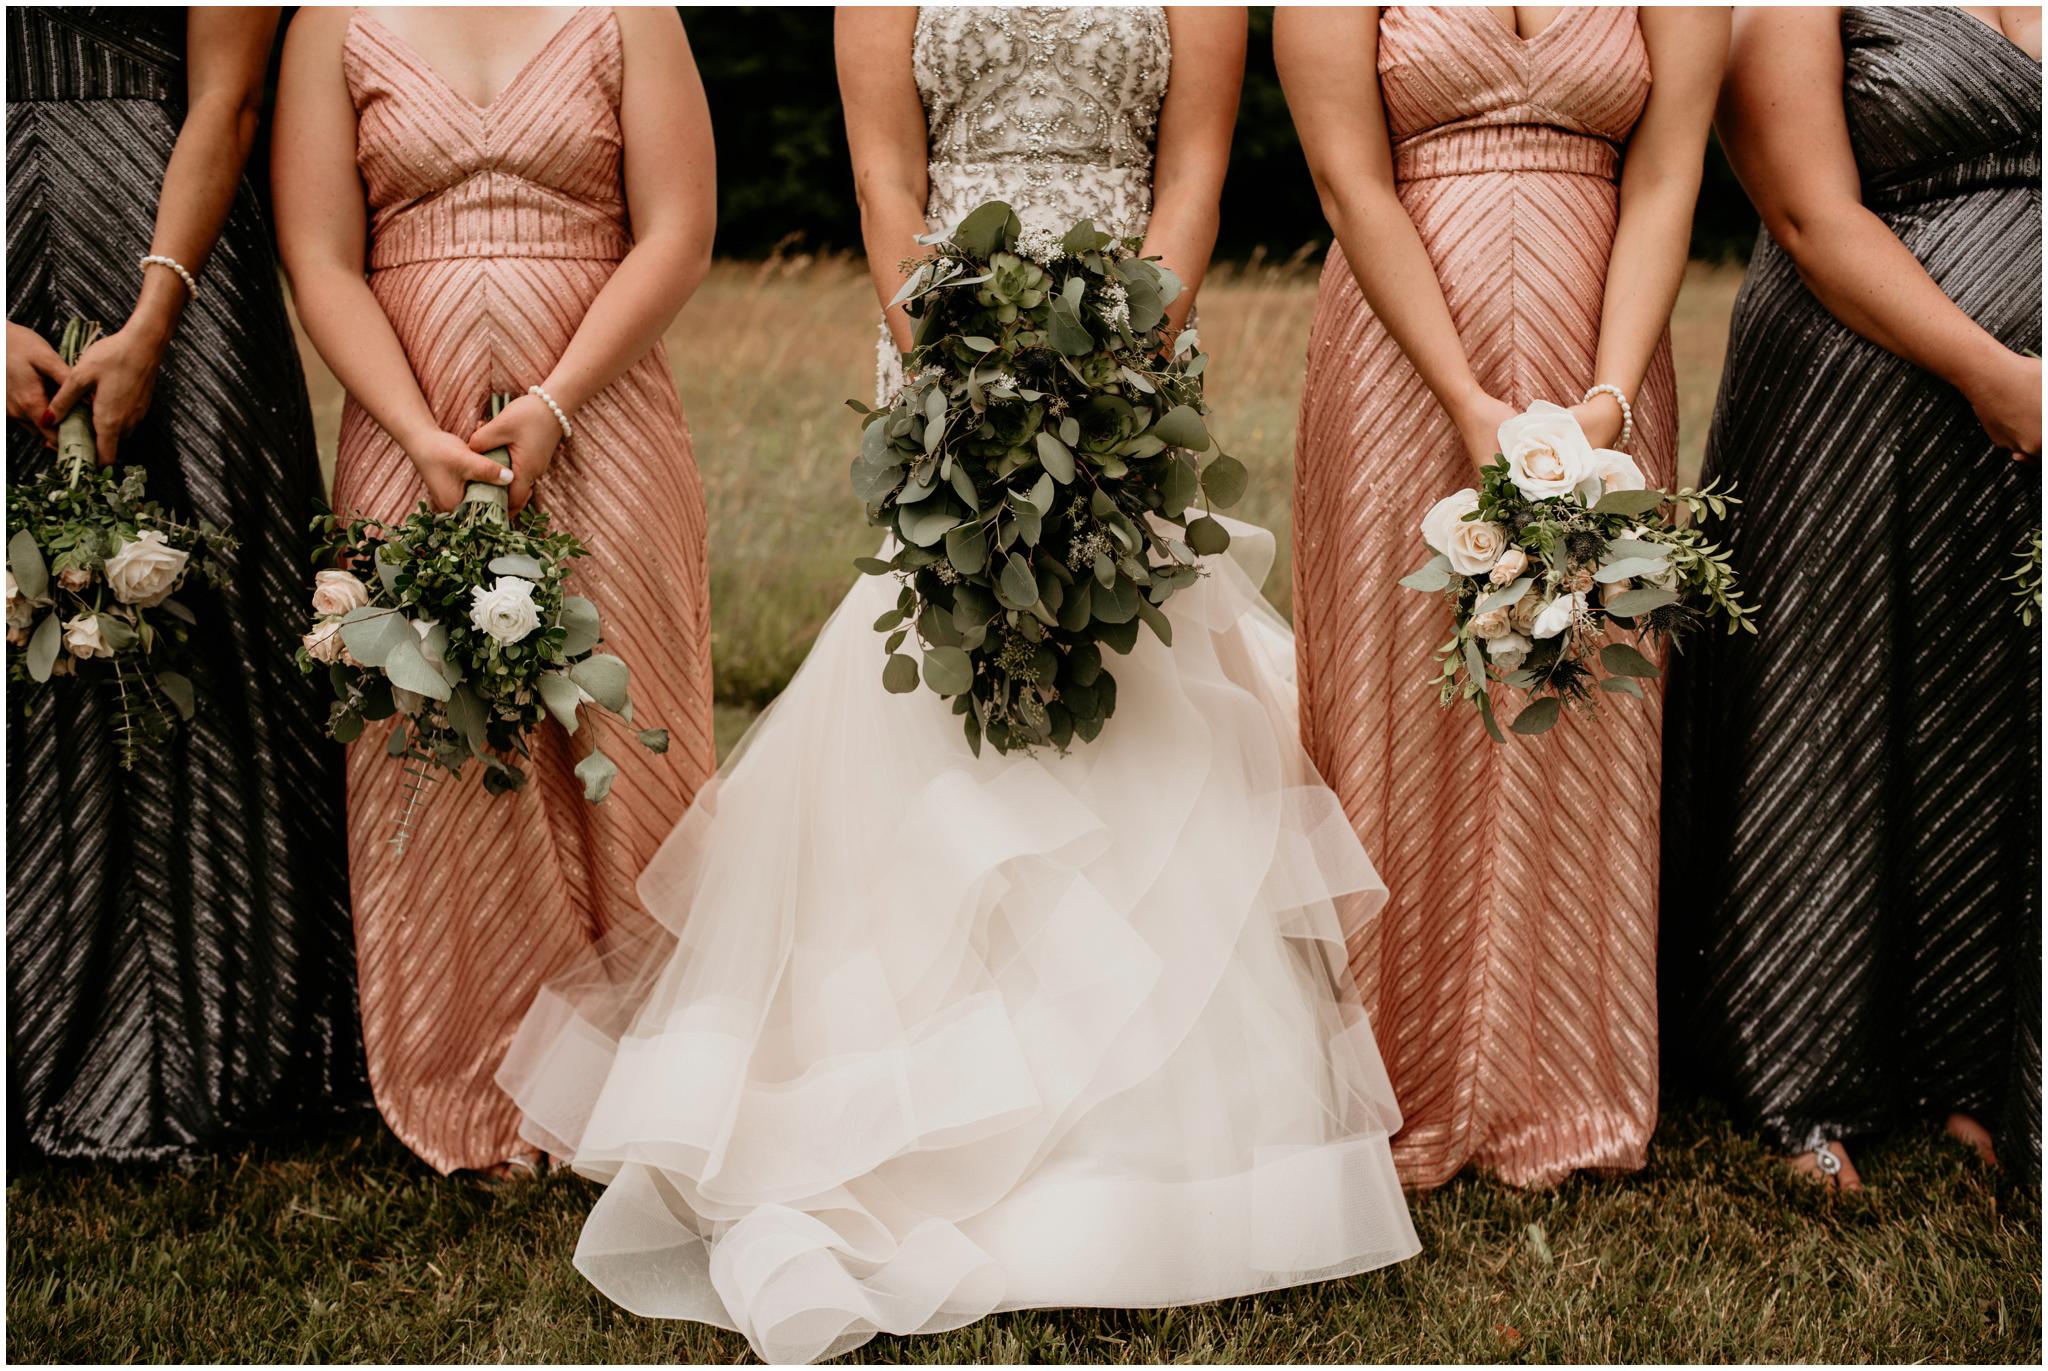 alex-and-matthew-three-cs-farm-venue-seattle-wedding-photographer-069.jpg